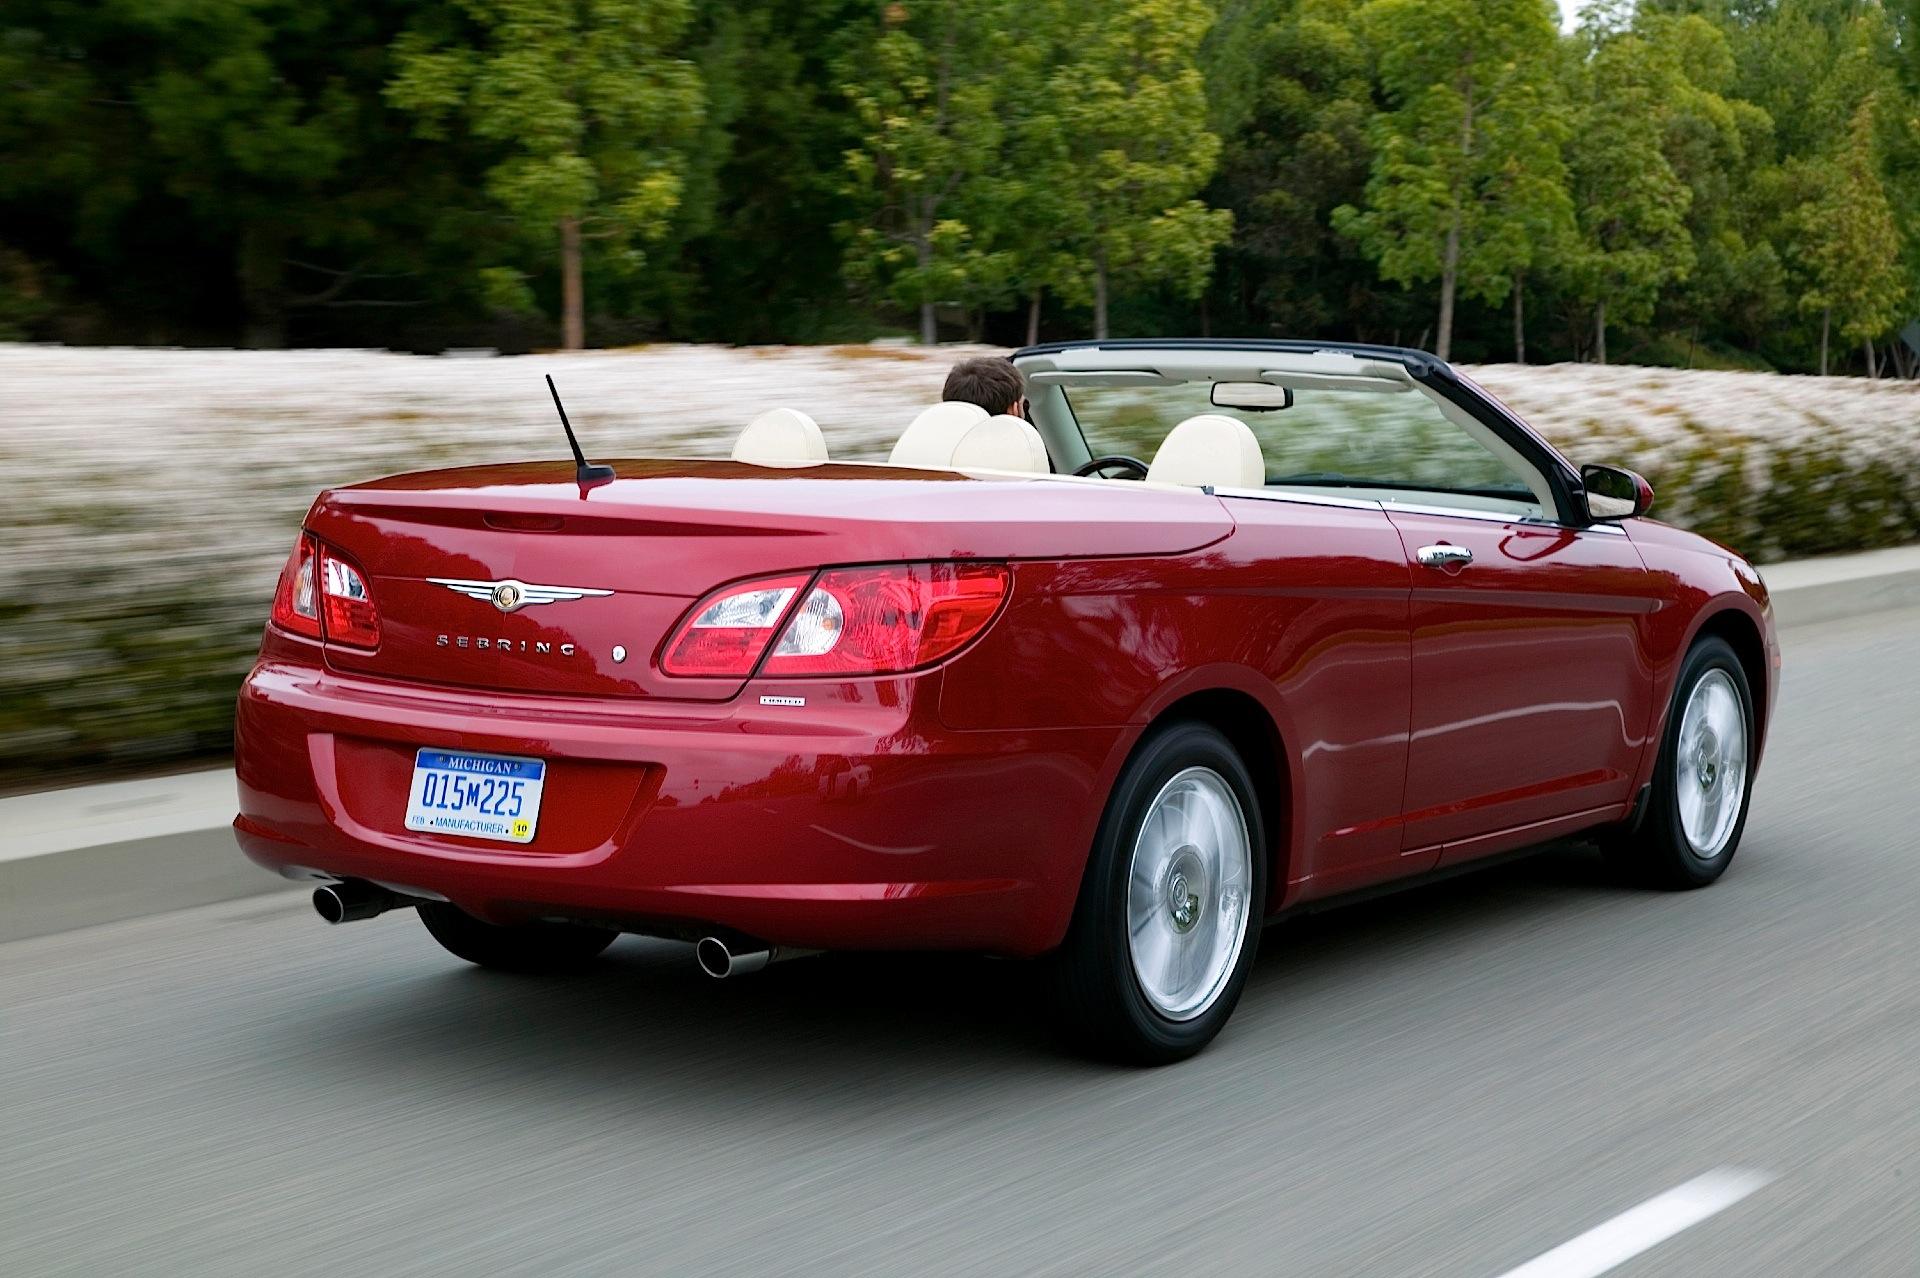 chrysler sebring convertible specs 2007 2008 2009 2010 autoevolution. Black Bedroom Furniture Sets. Home Design Ideas